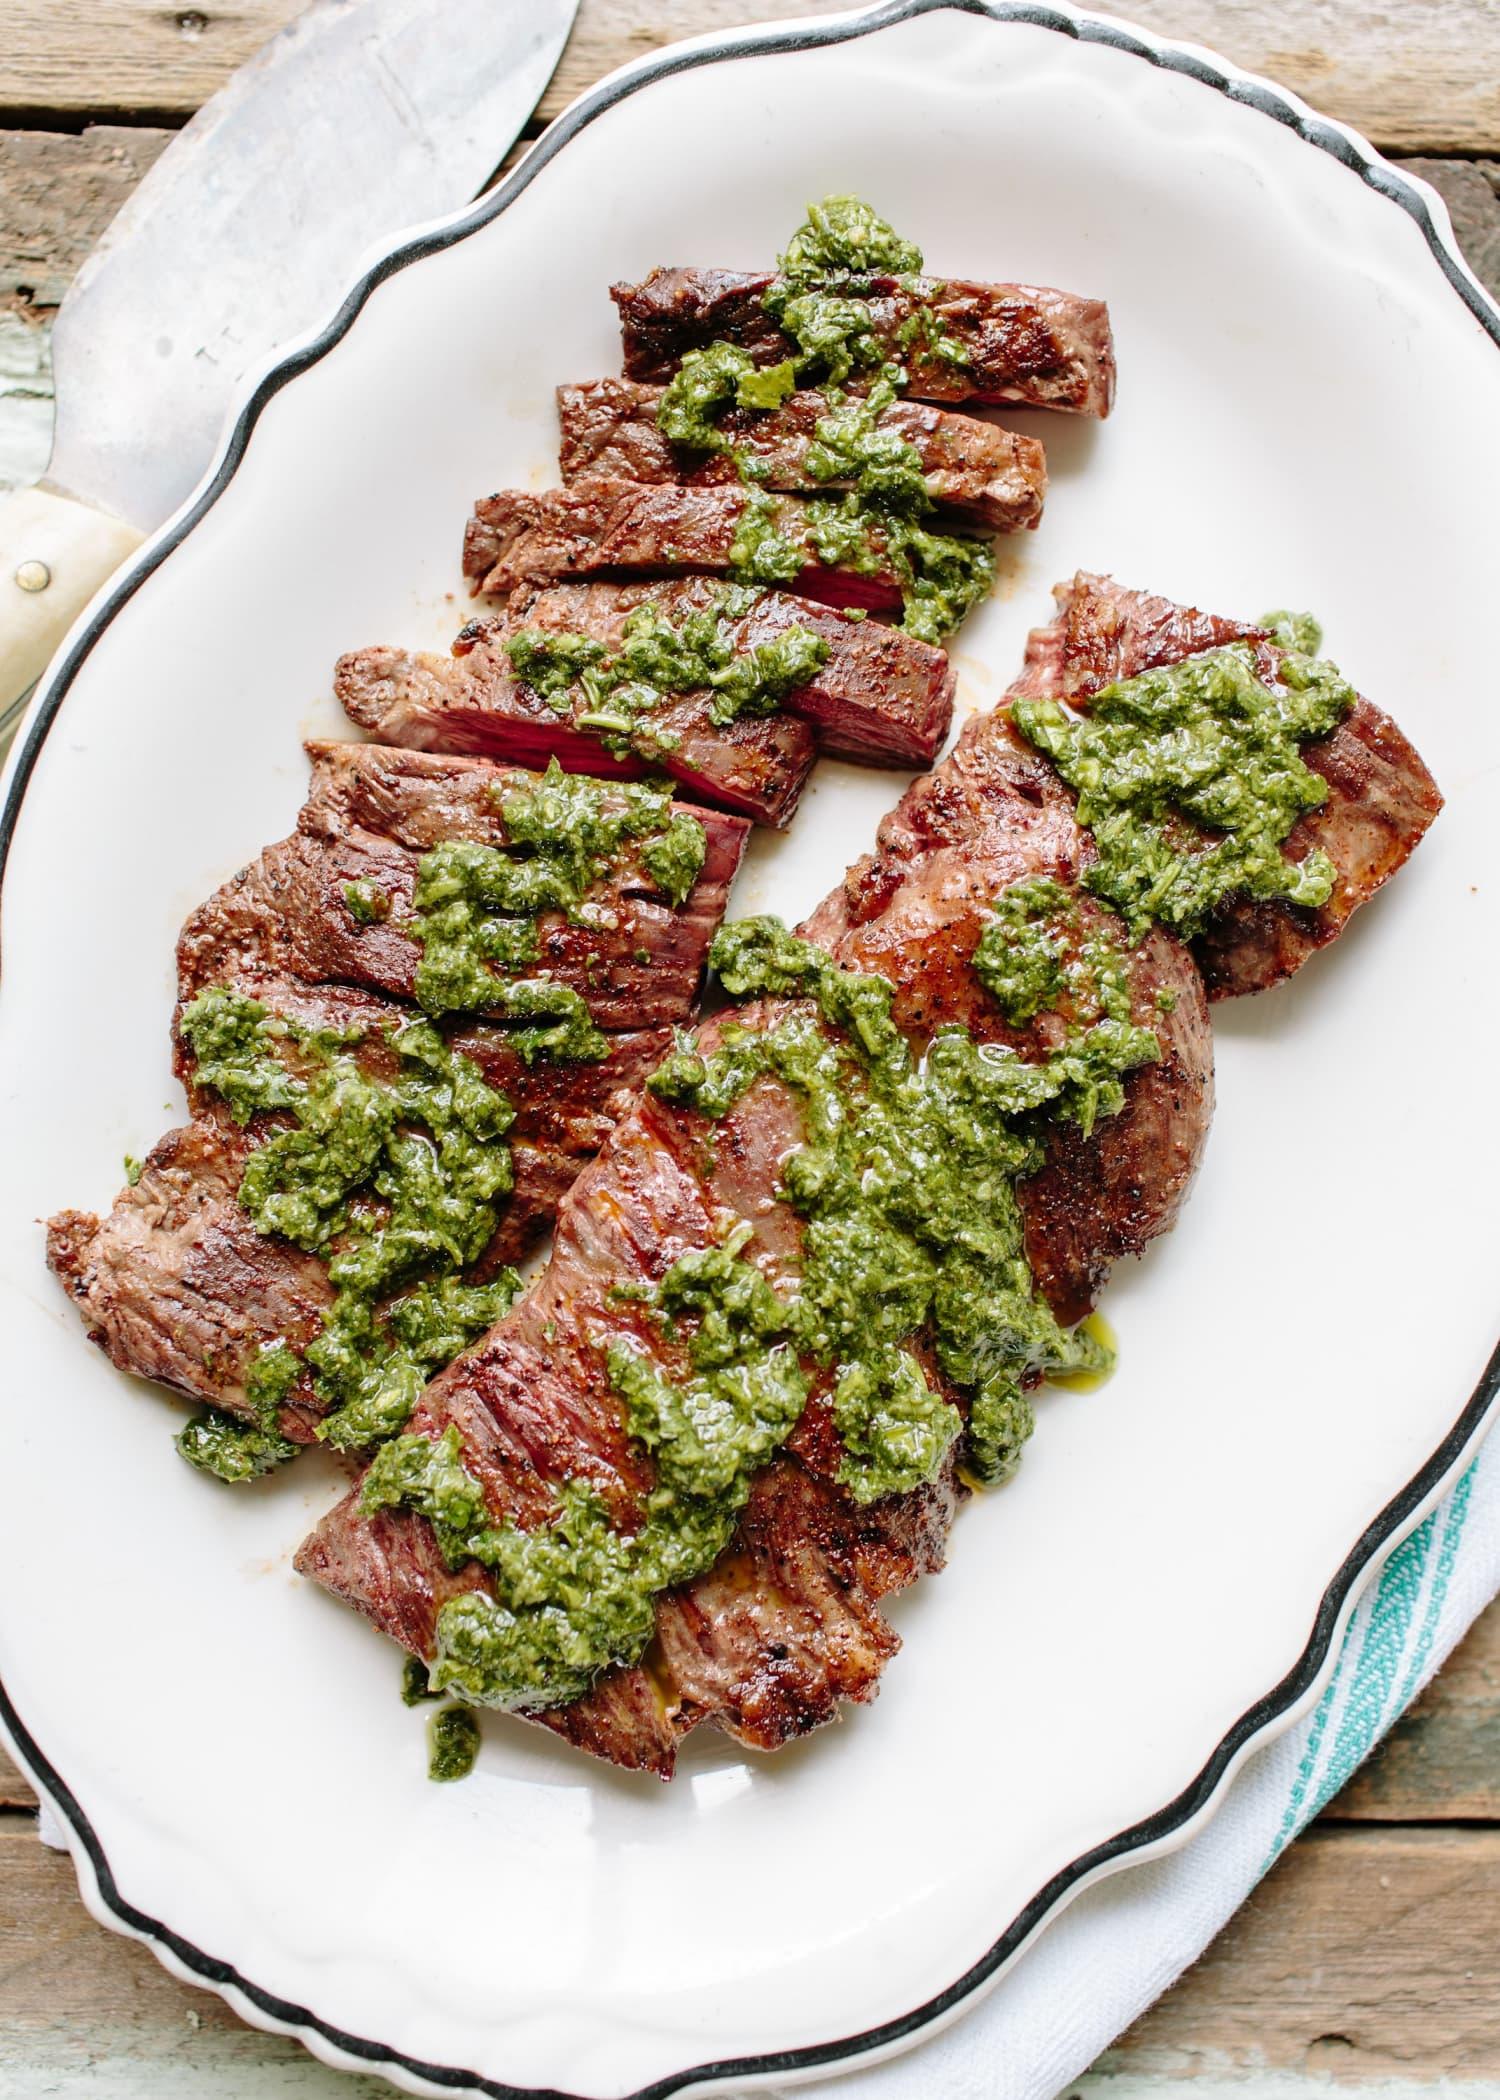 Recipe: Skirt Steak with Chimichurri